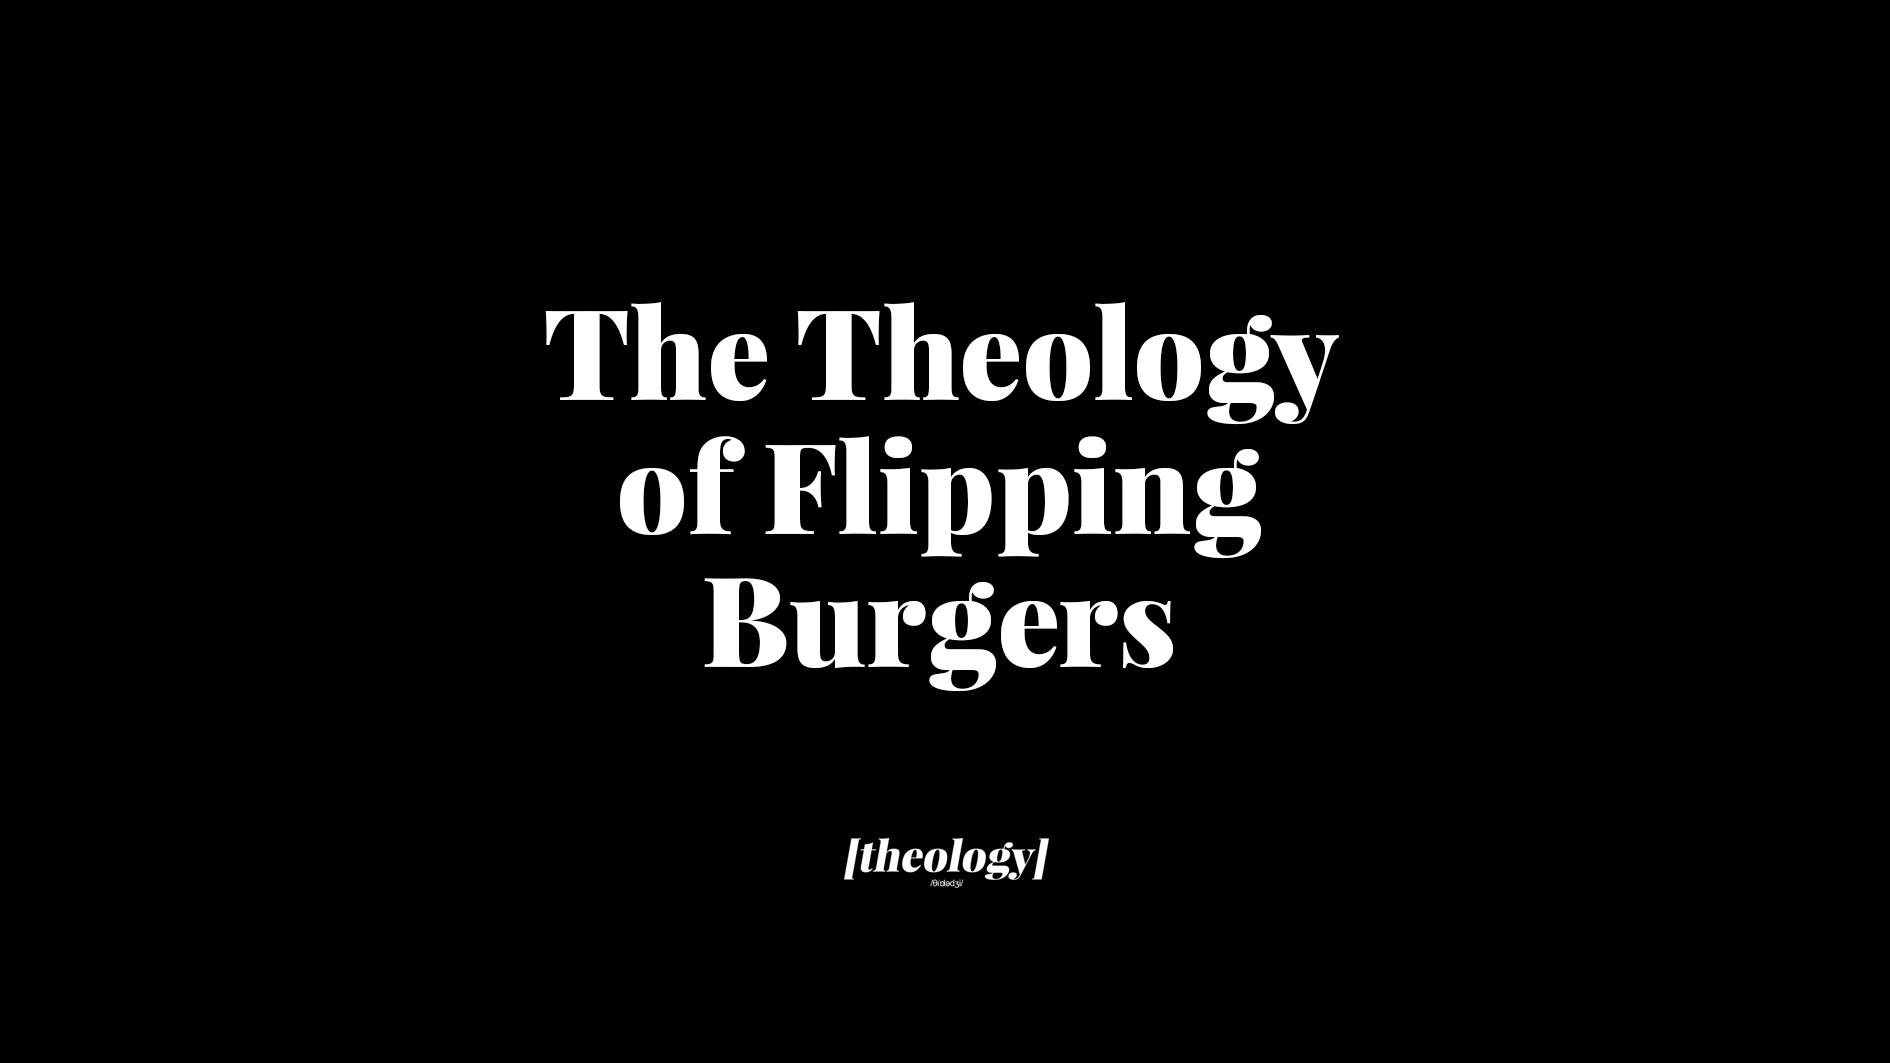 theology blog graphic.jpg